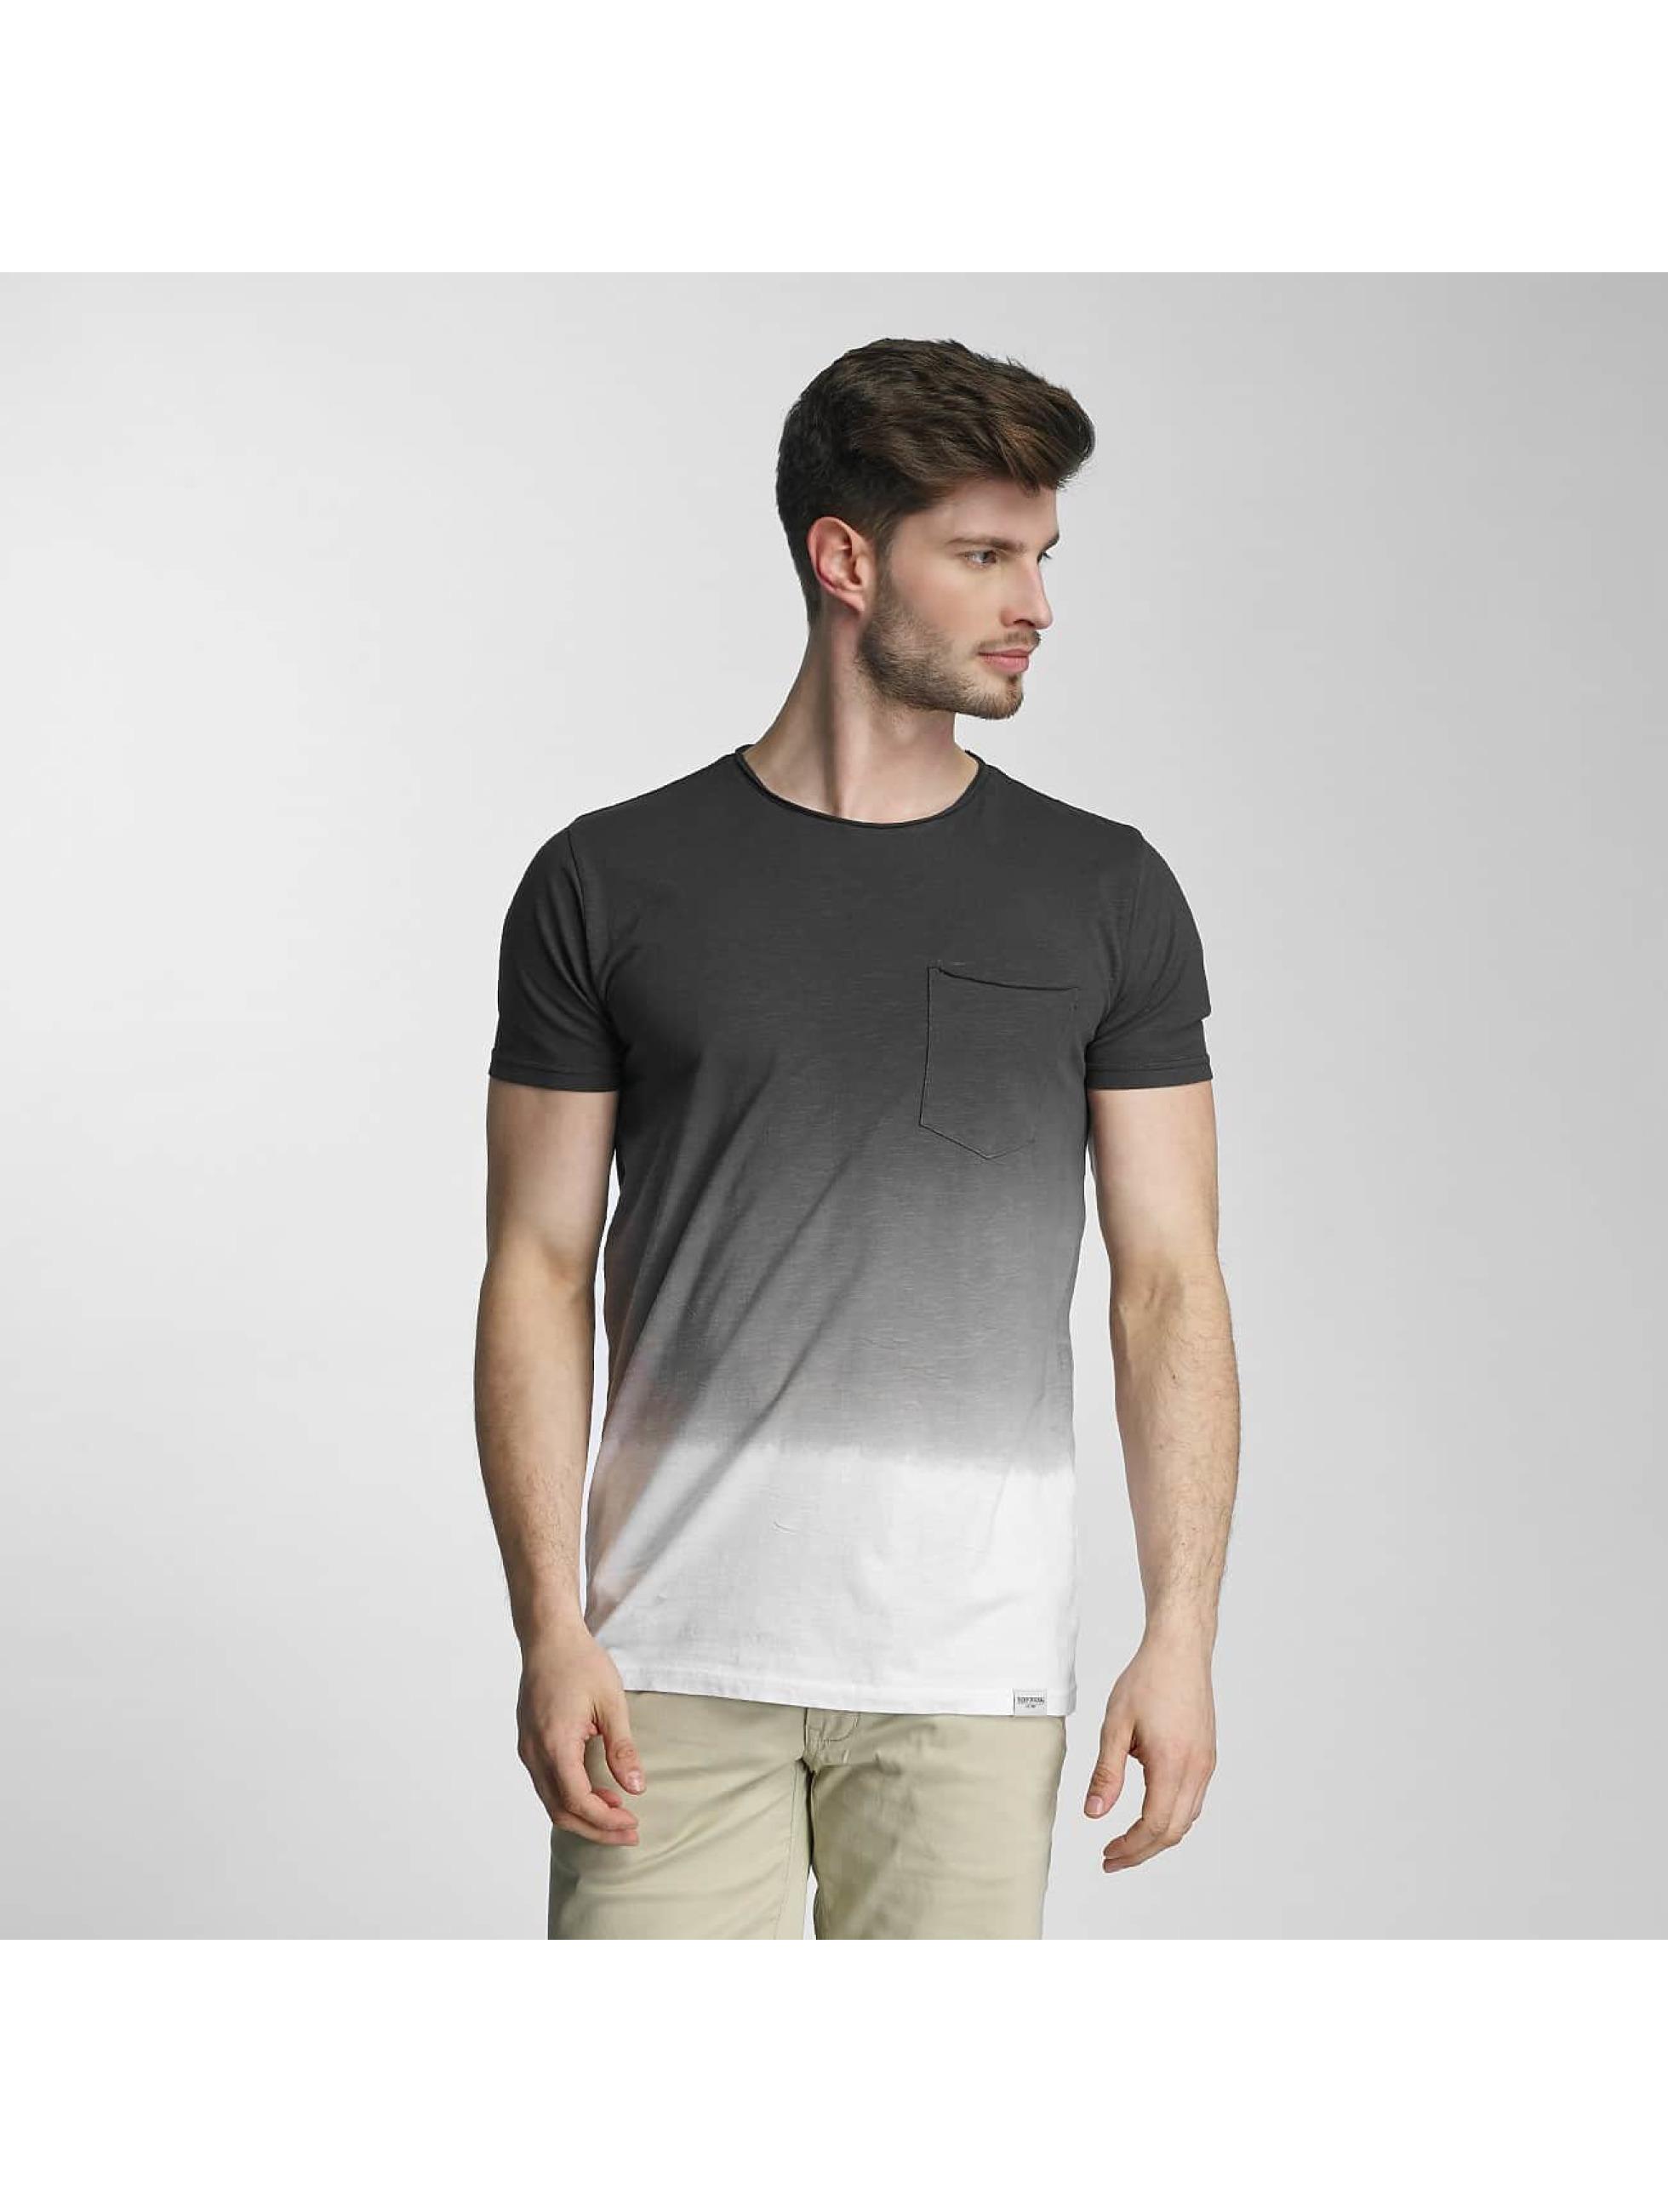 SHINE Original Männer T-Shirt Dip Dyed in grau